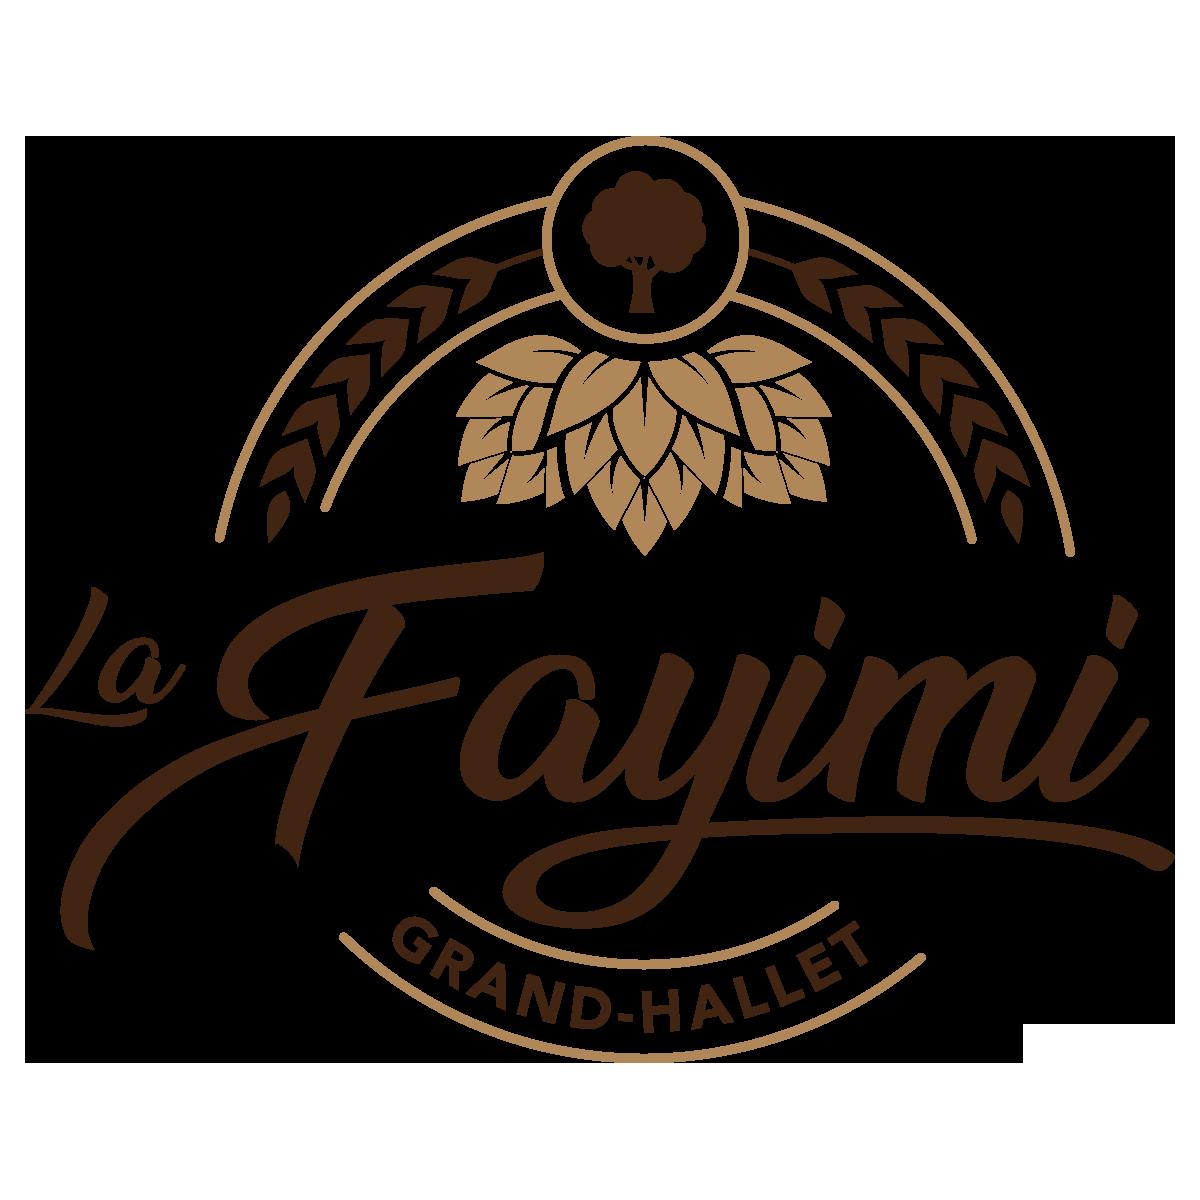 La Fayimi